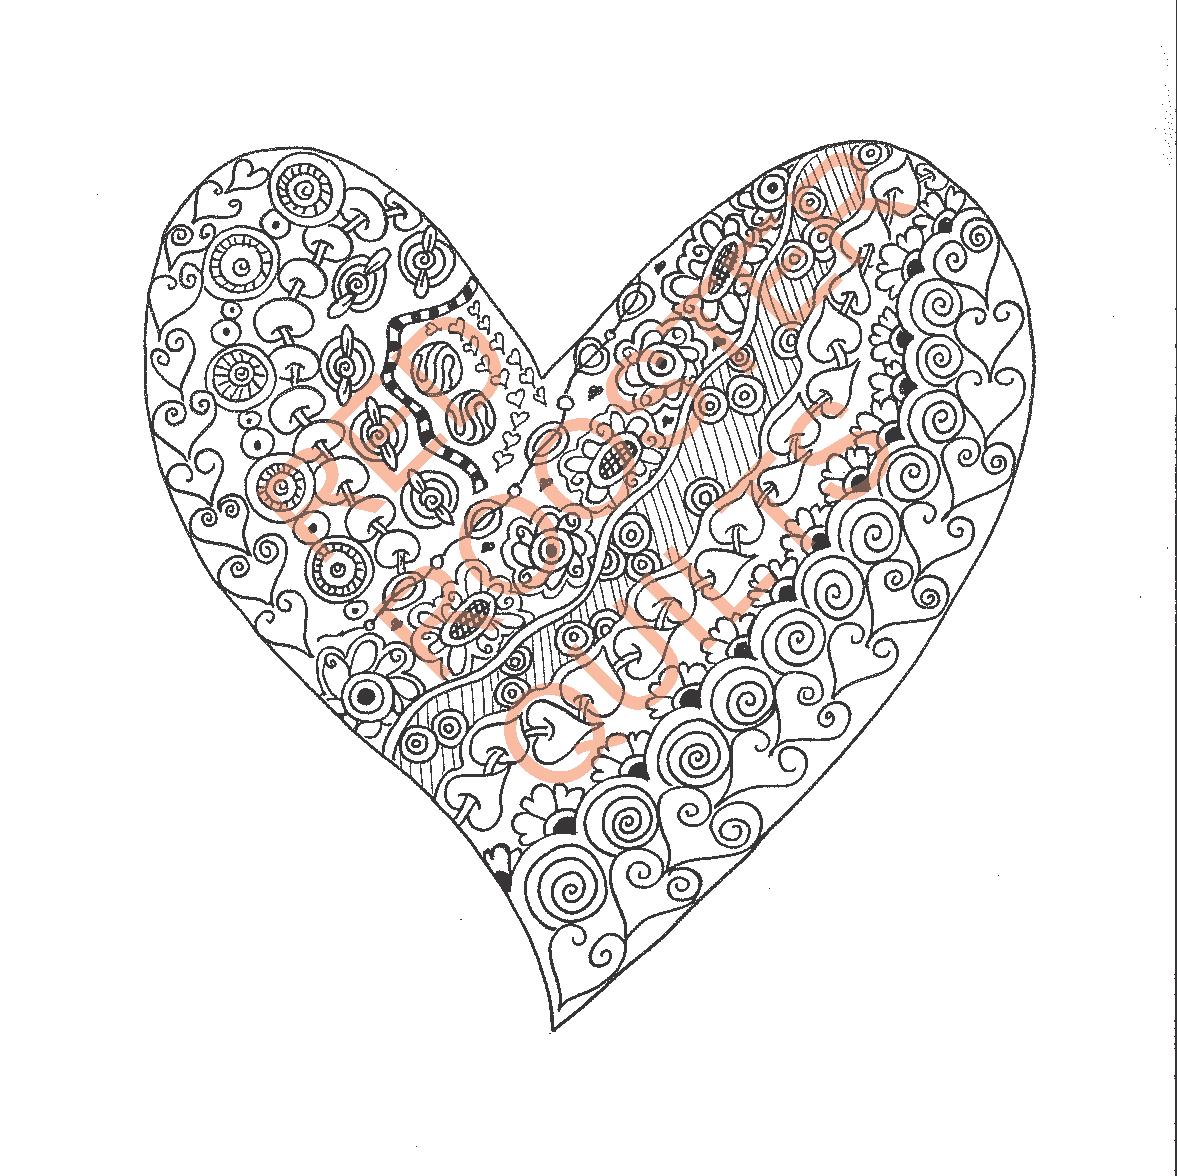 Zentangle Inspired Heart Swatch - RRQ Original